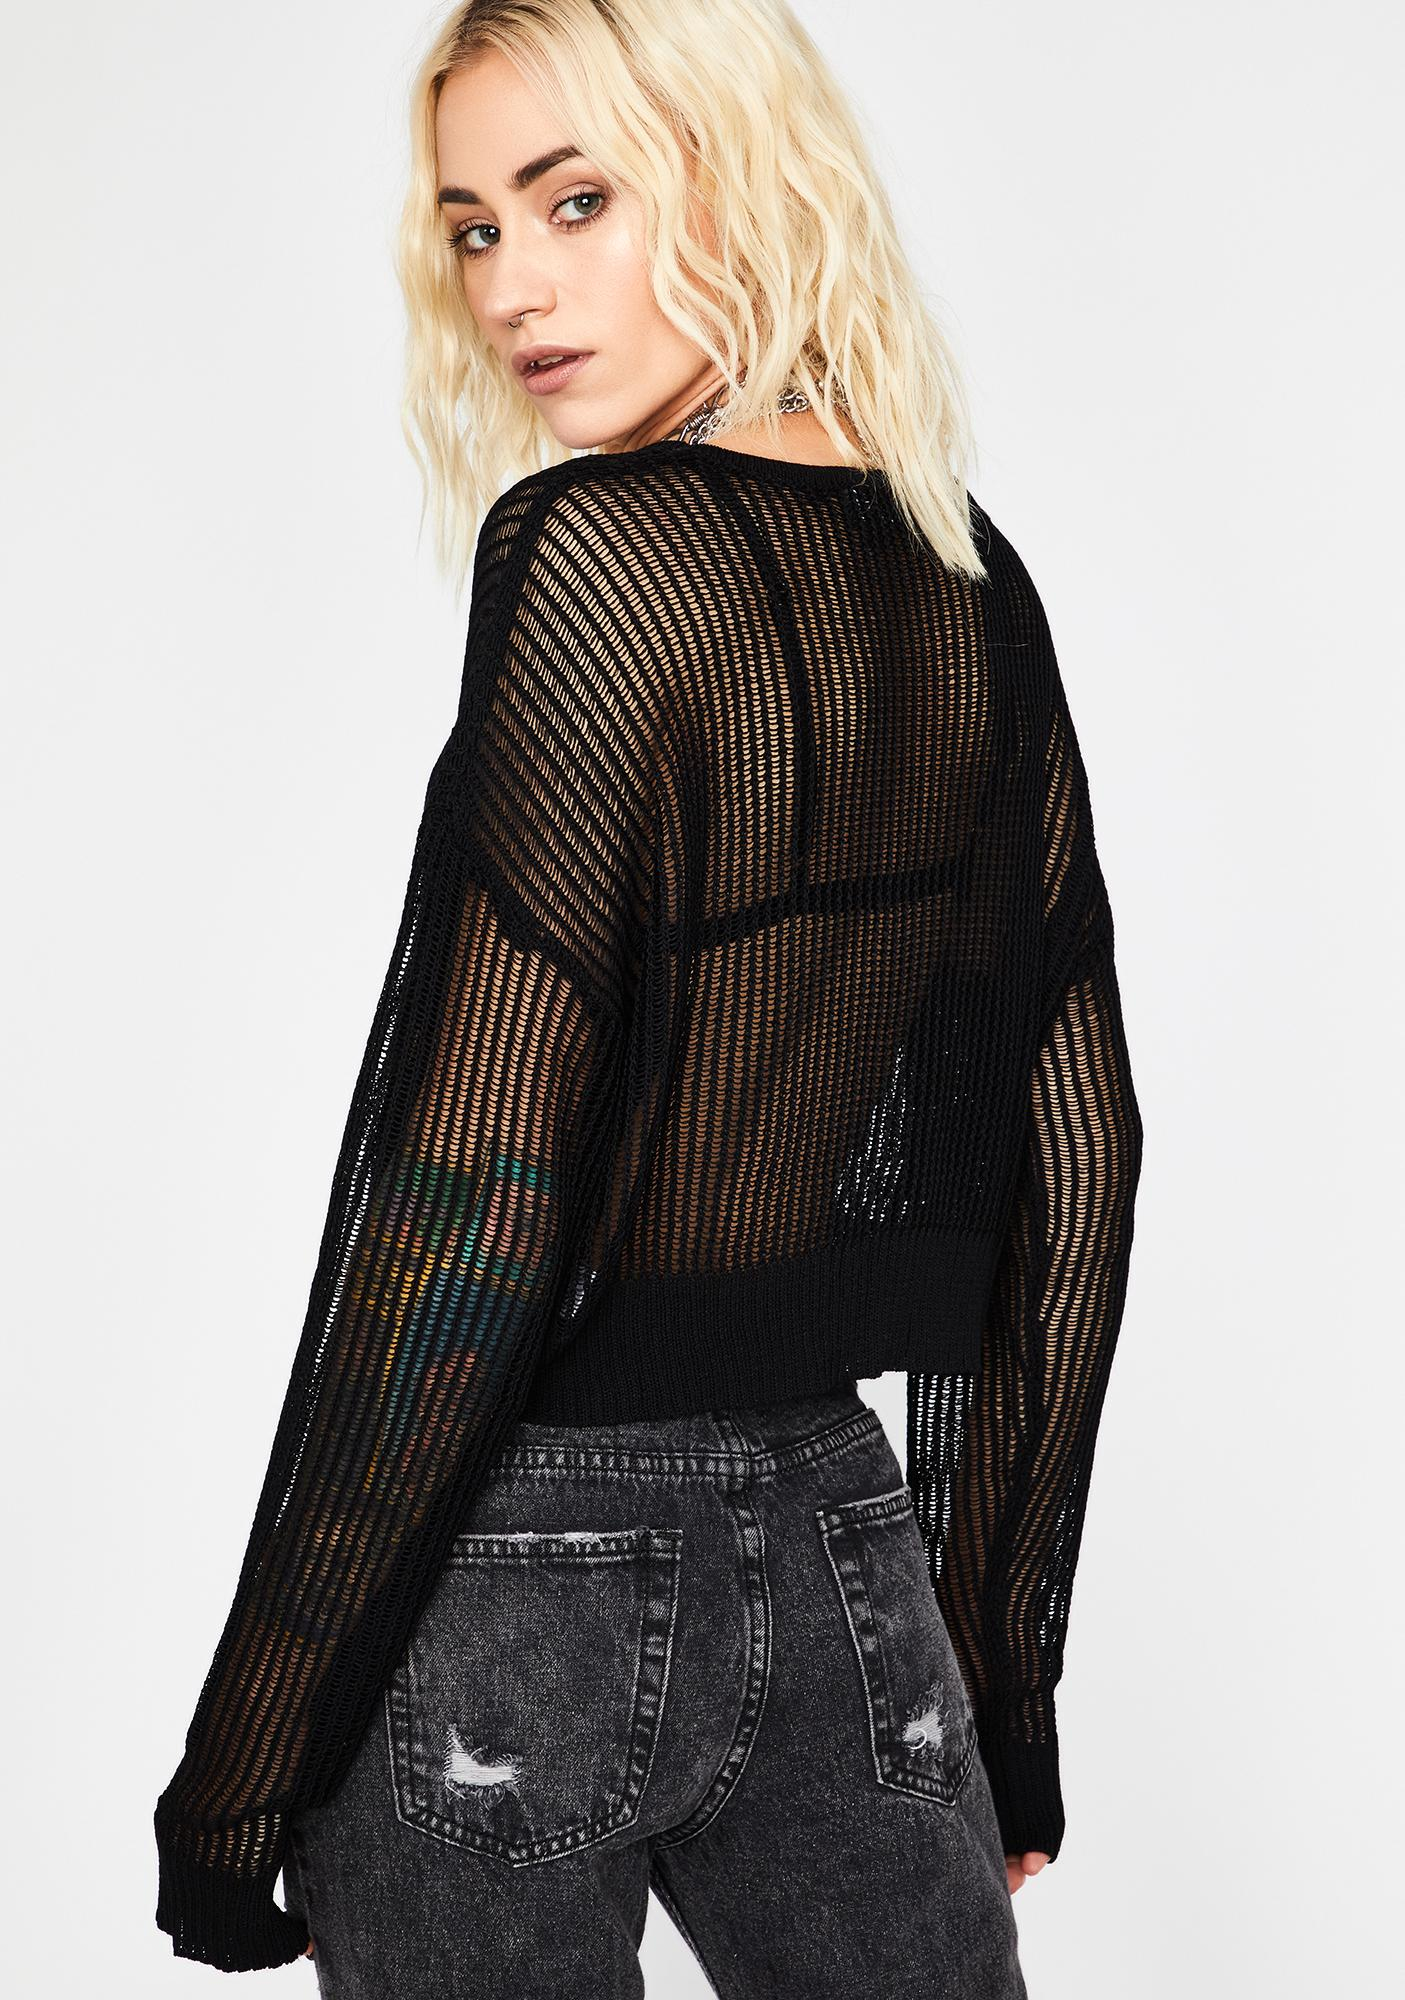 Black Do Or Dare Sheer Sweater